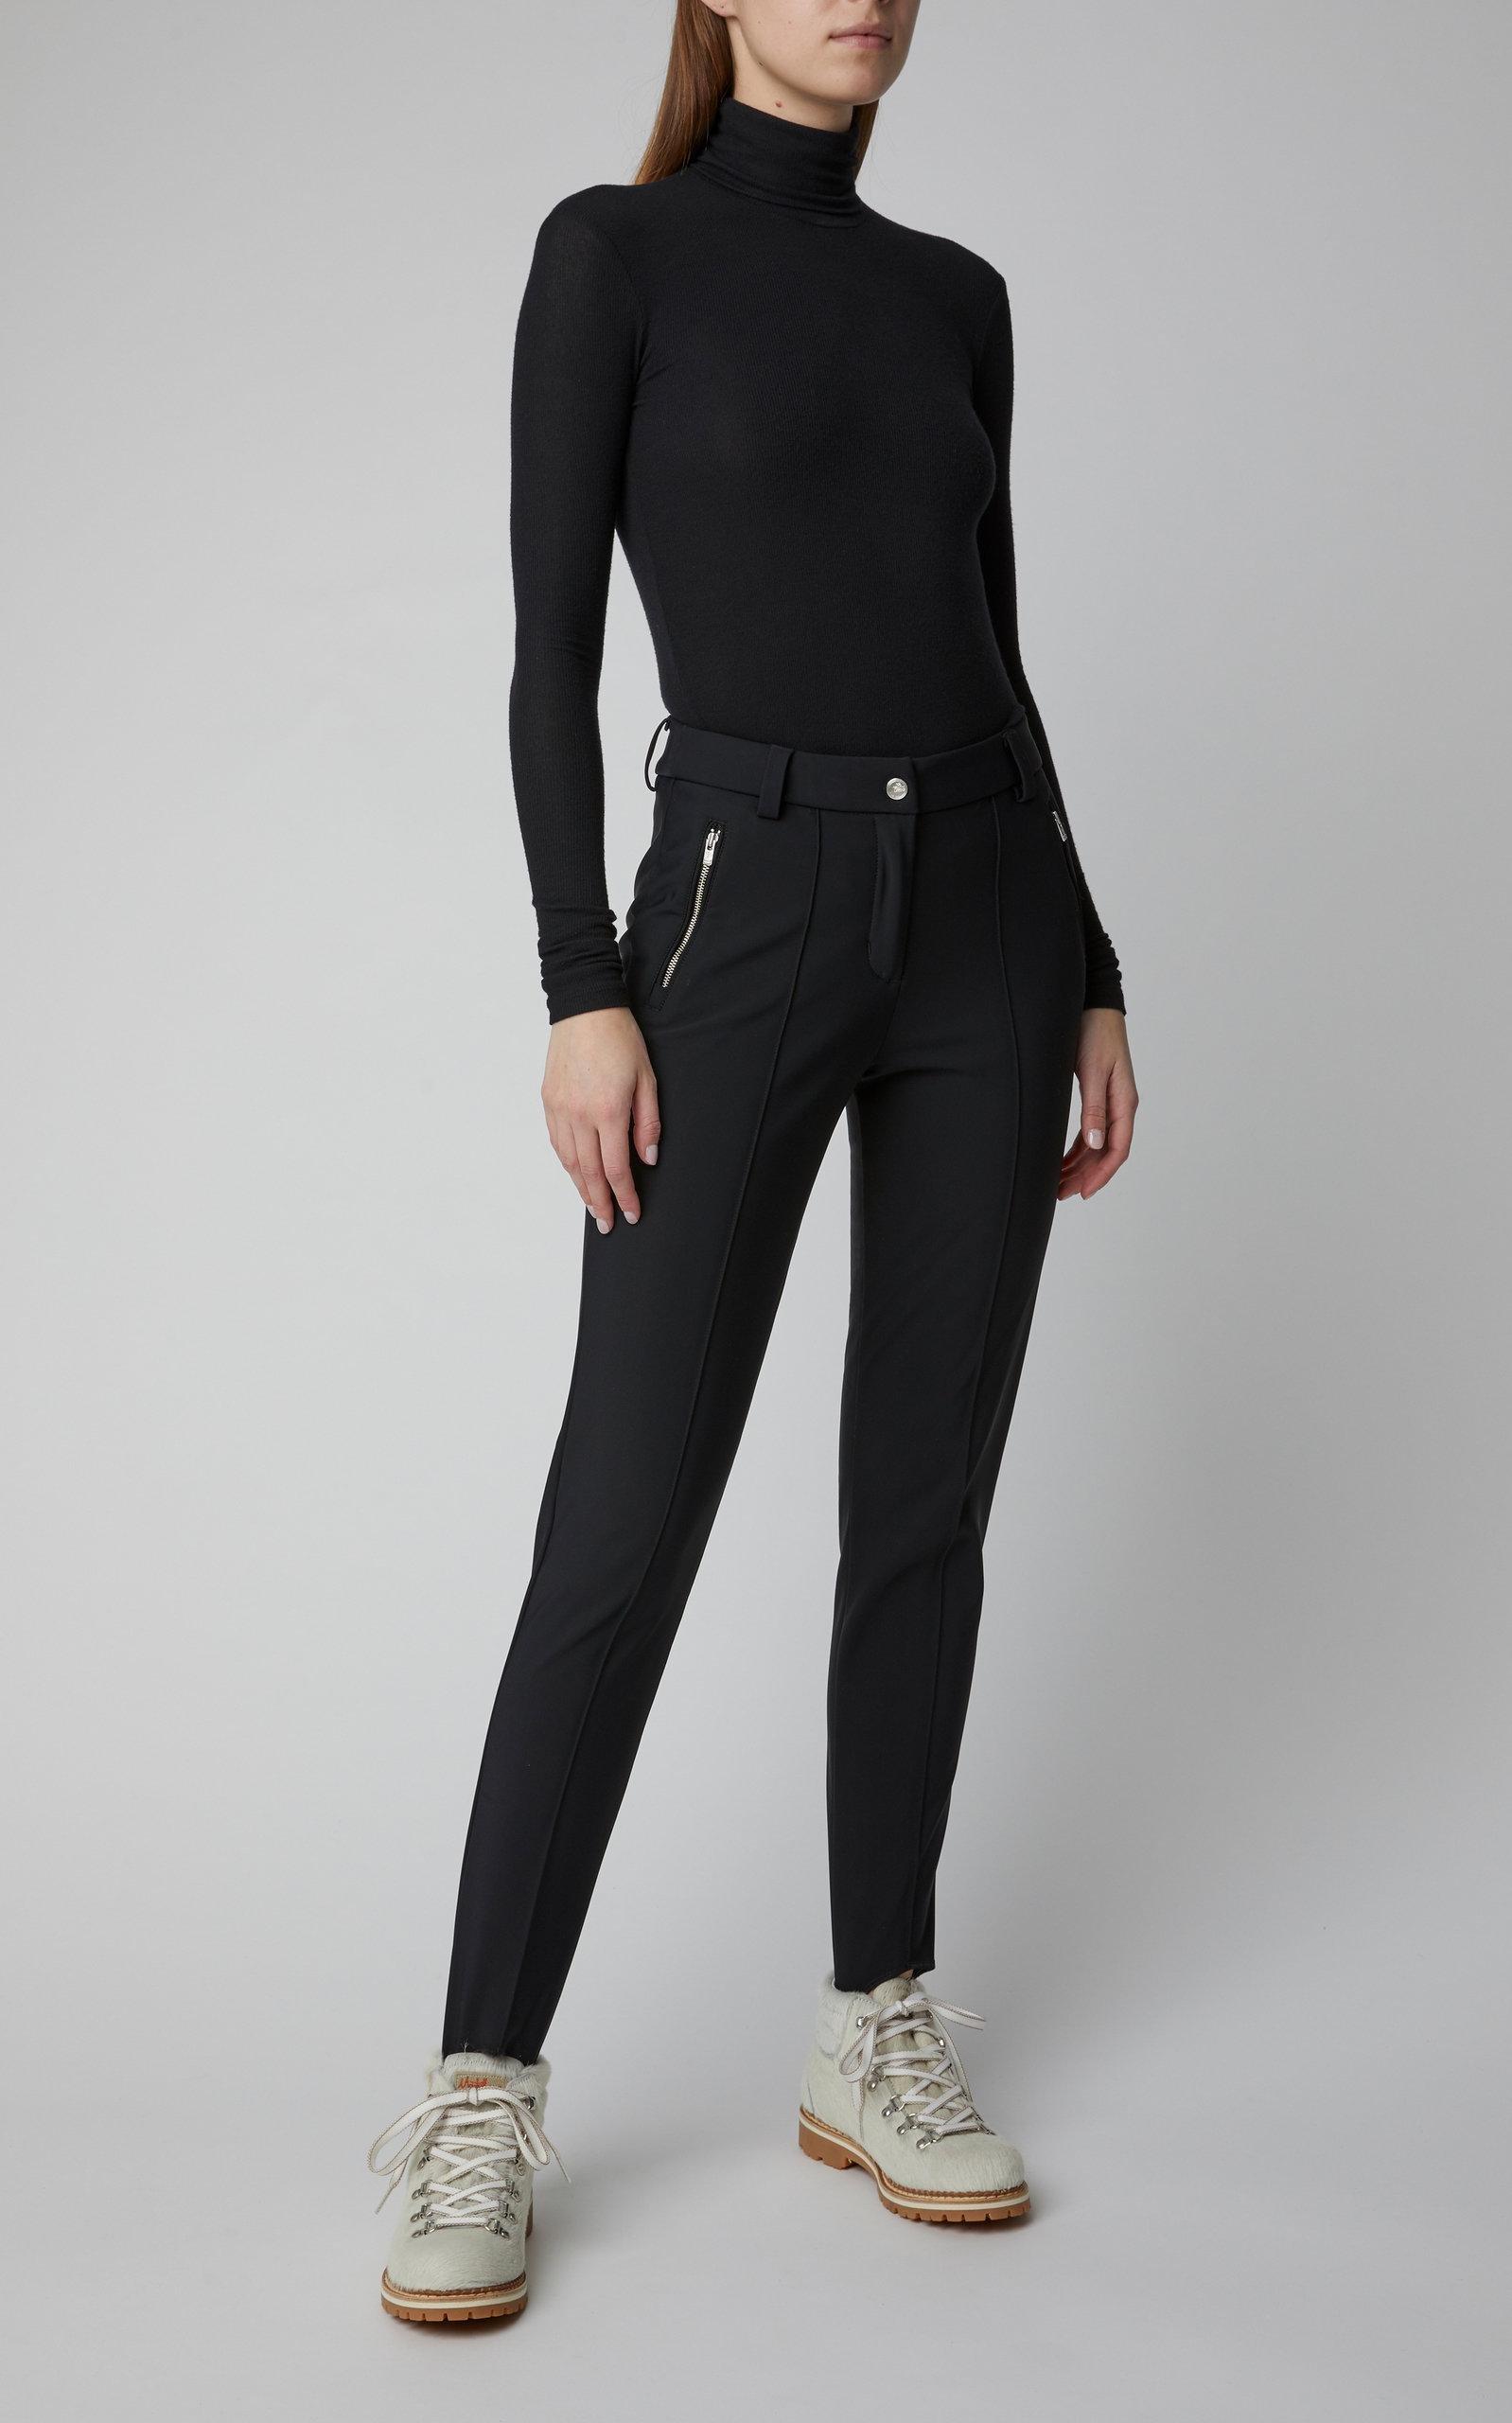 Pants Belalp Stretch Black Fusalp In Lyst Knit Stirrup sthQCxrd